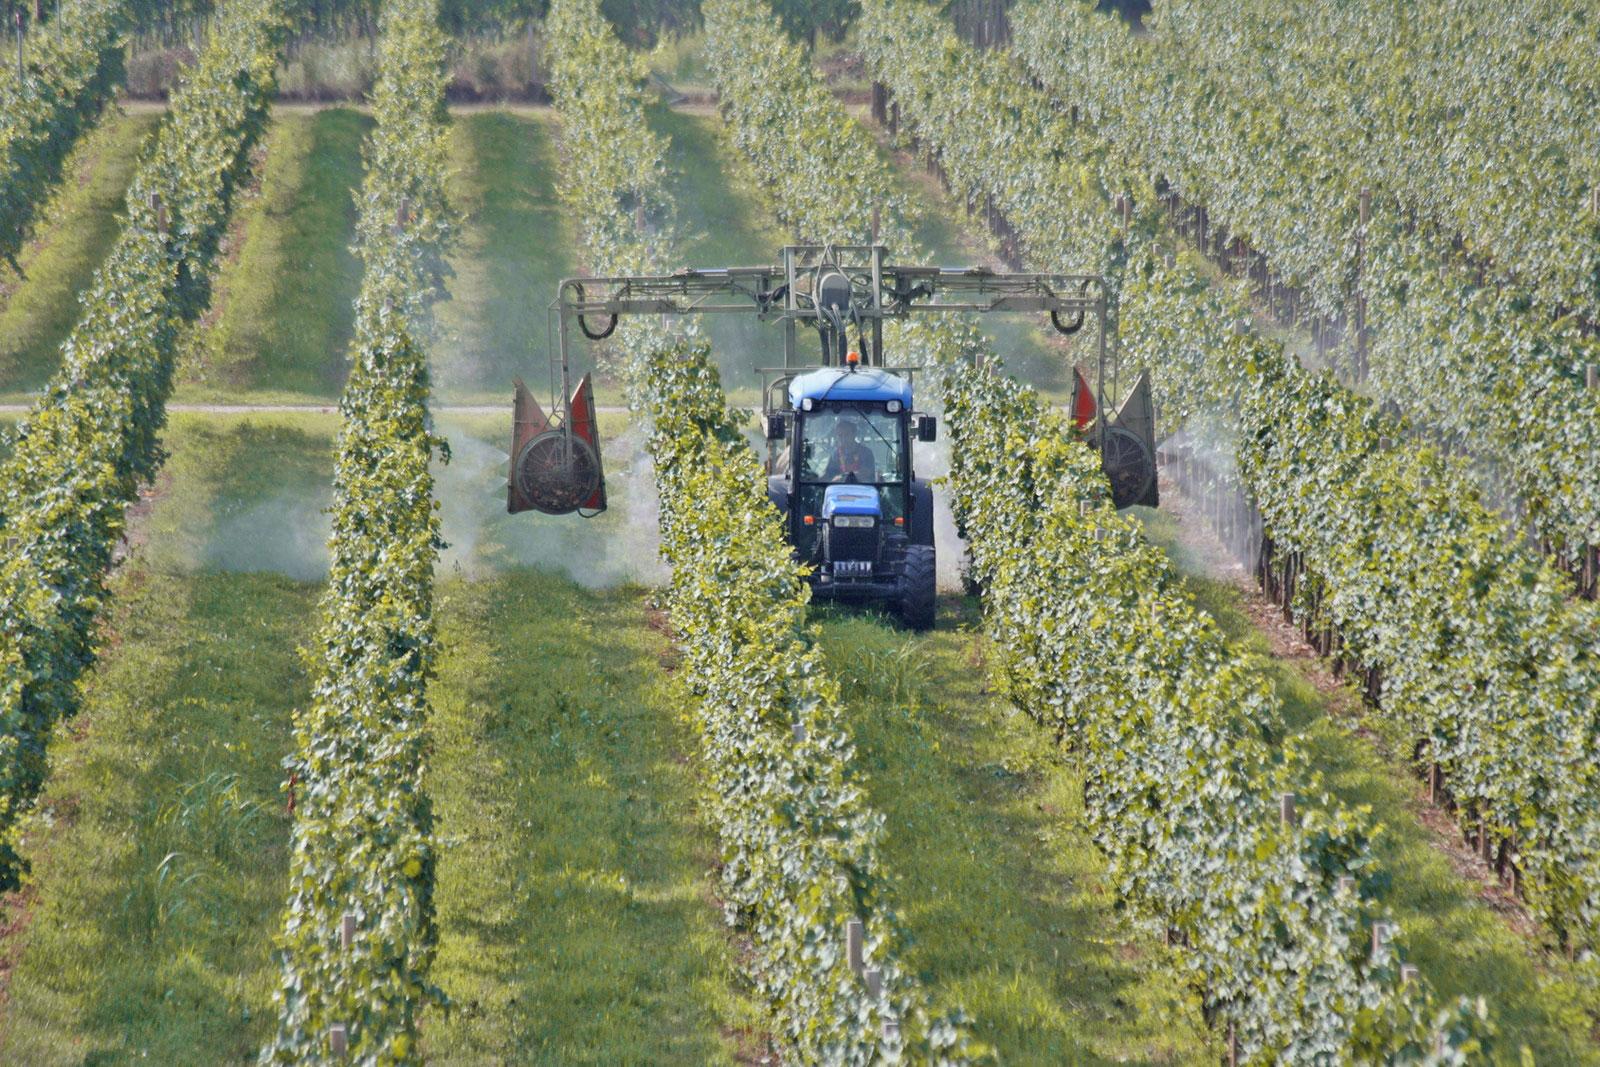 impianti irrigazione agricoltura cremona